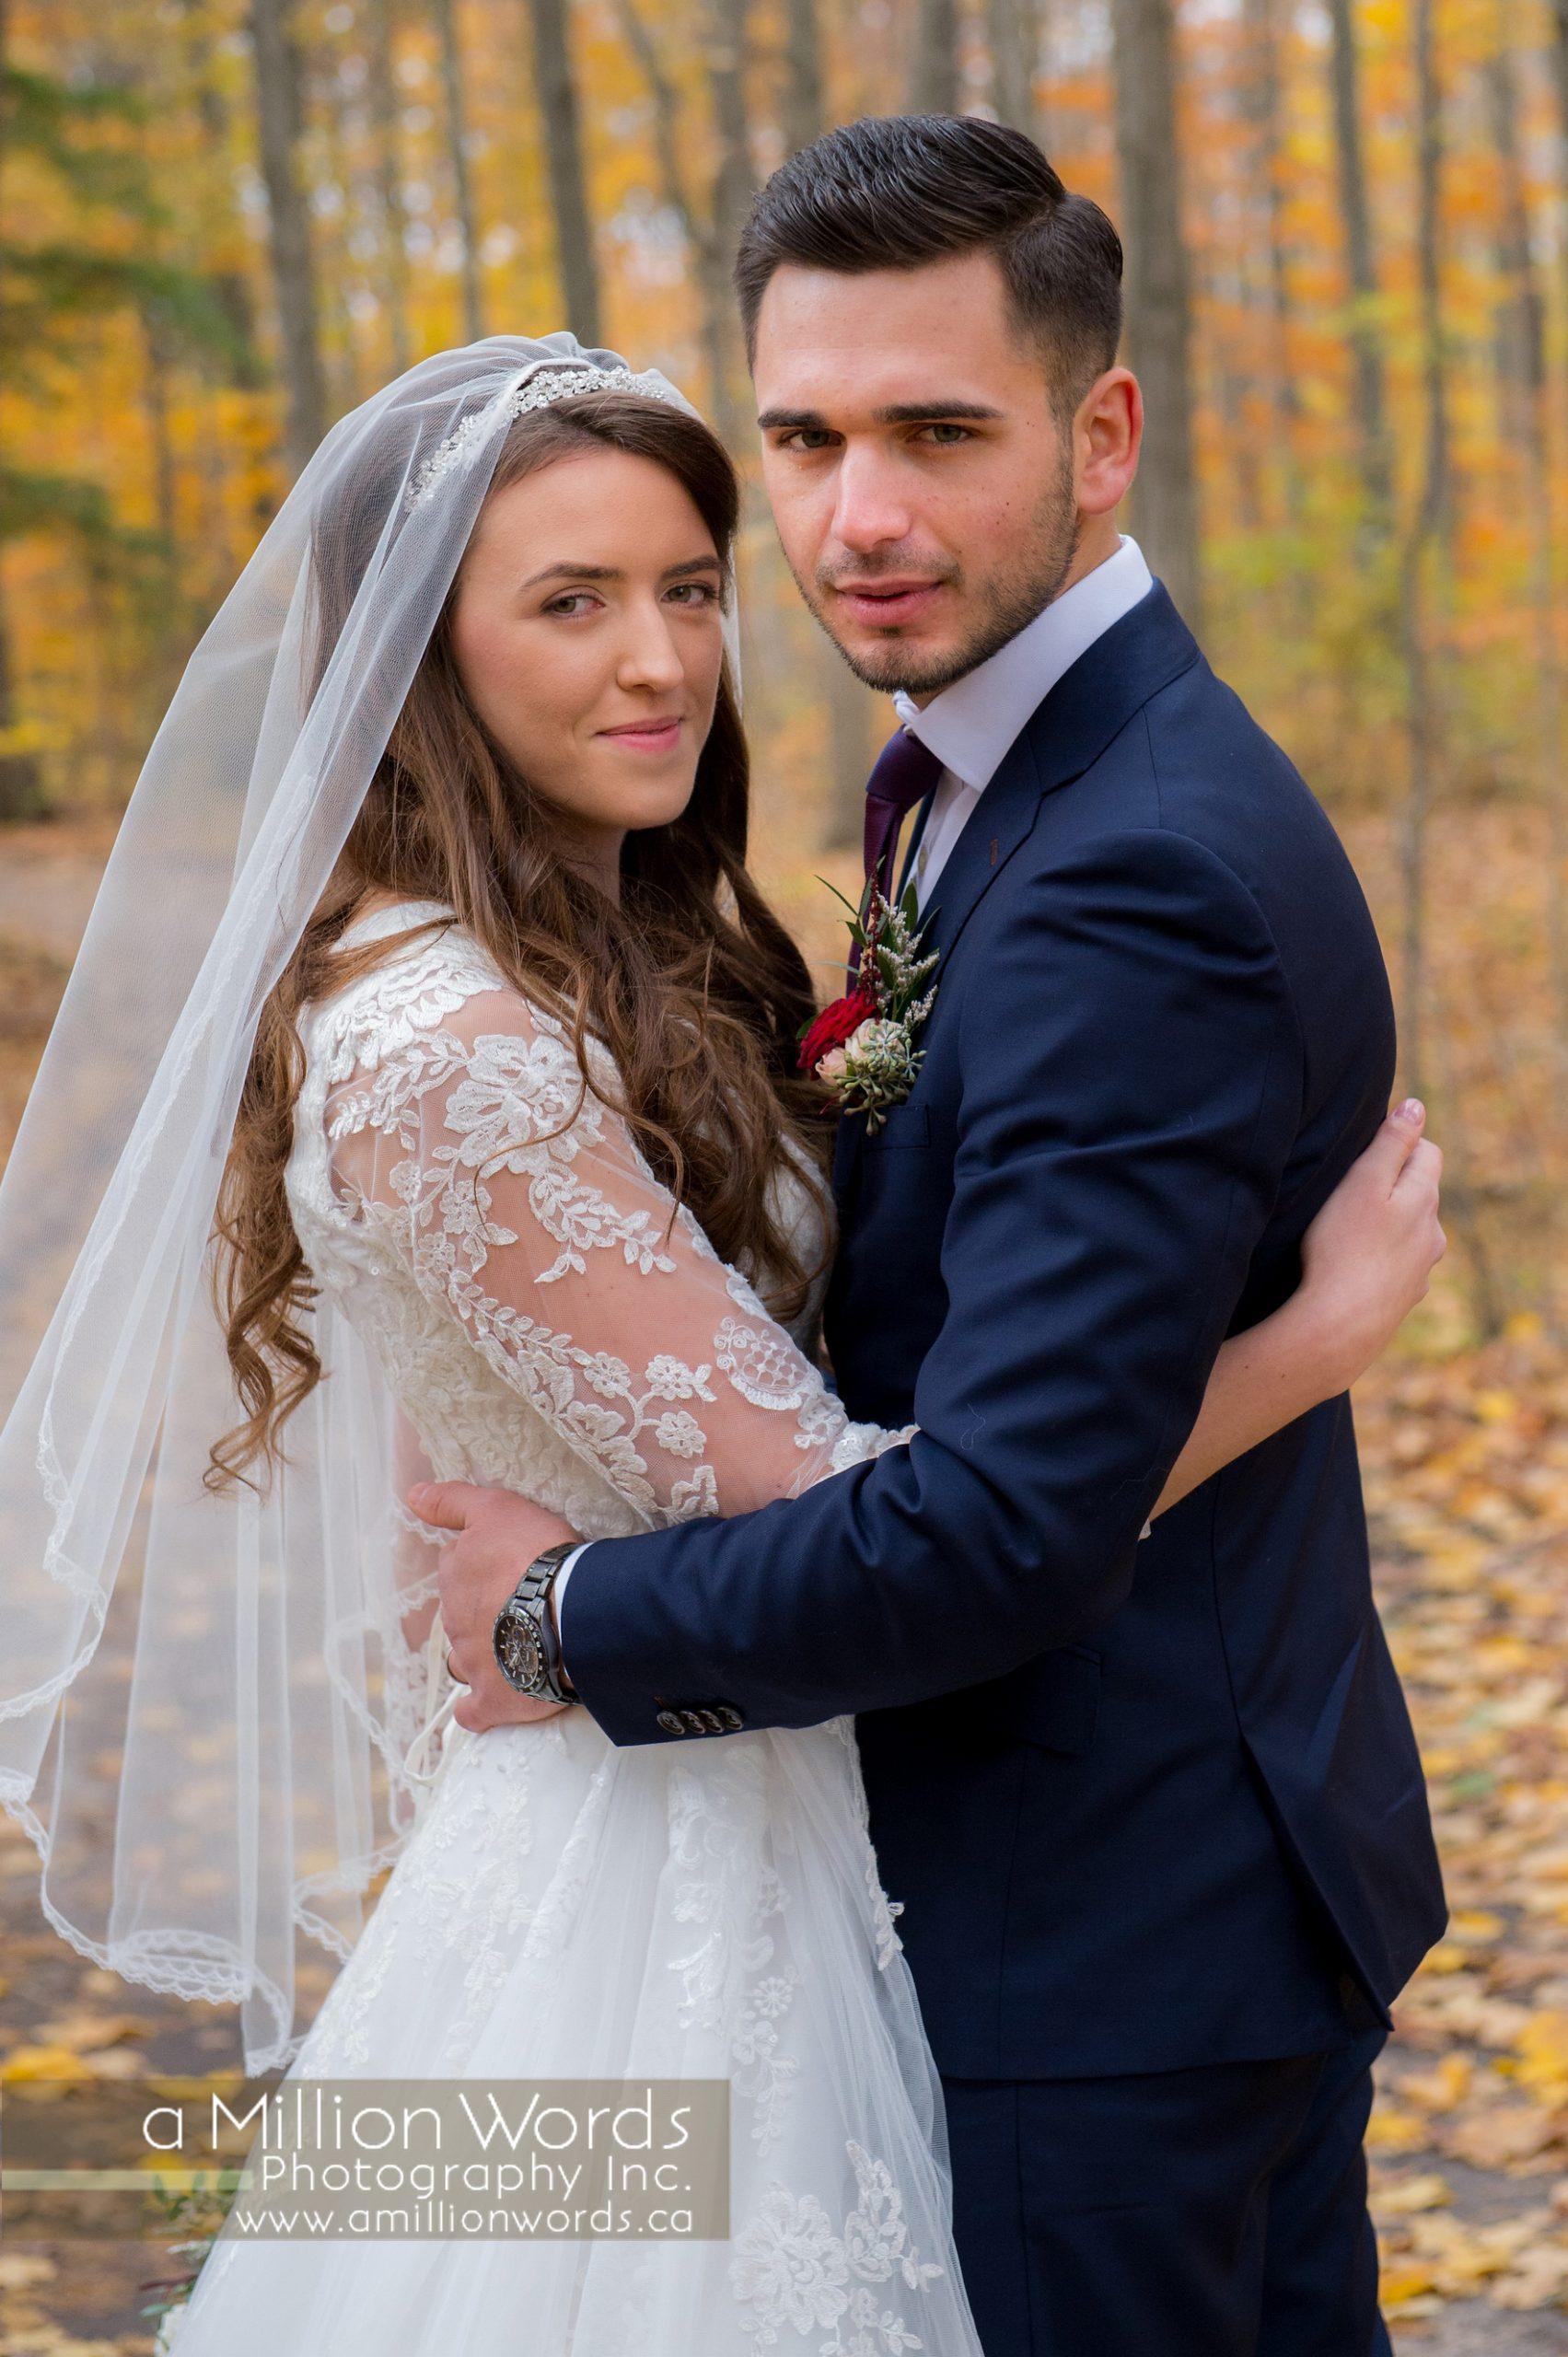 cambridge_afternoon_wedding_photography25